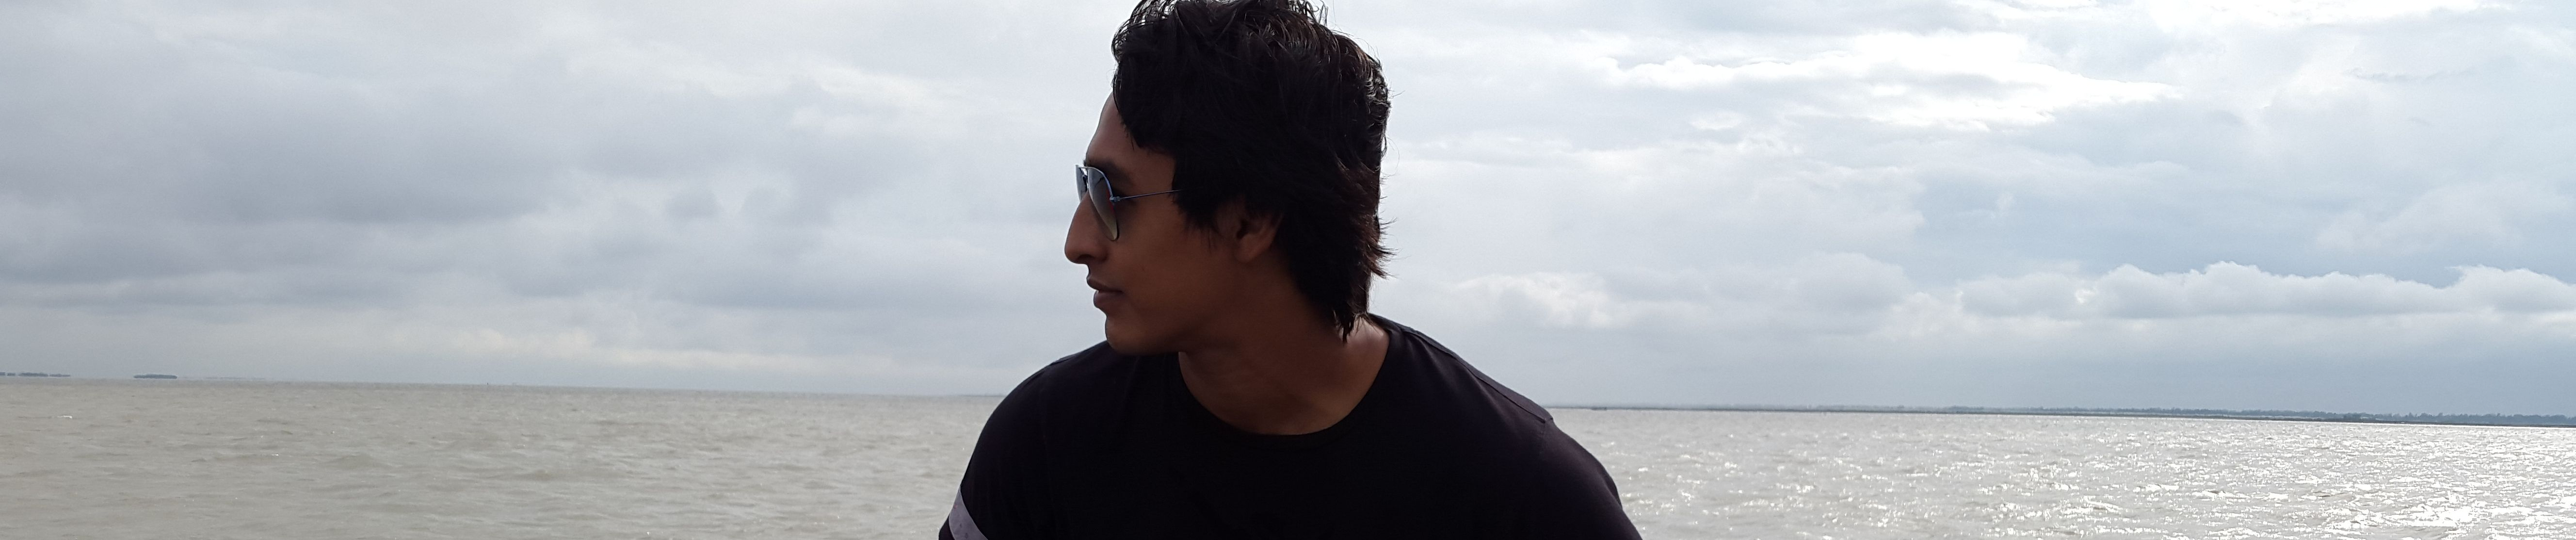 Shipan Datta   Free Listening on SoundCloud